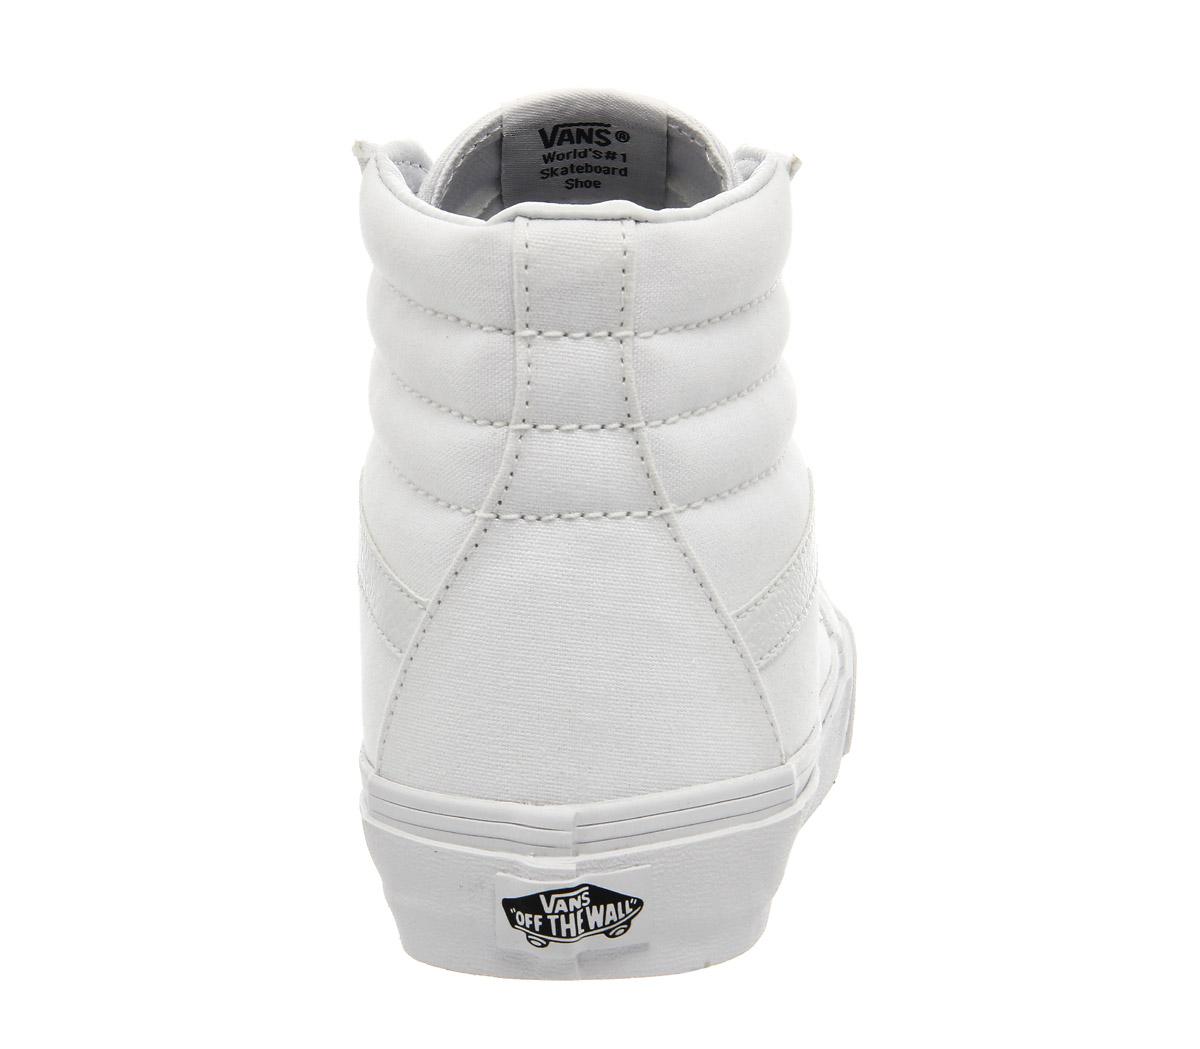 a22798031bd Womens-Vans-Sk8-Hi-True-White-Trainers-Shoes thumbnail